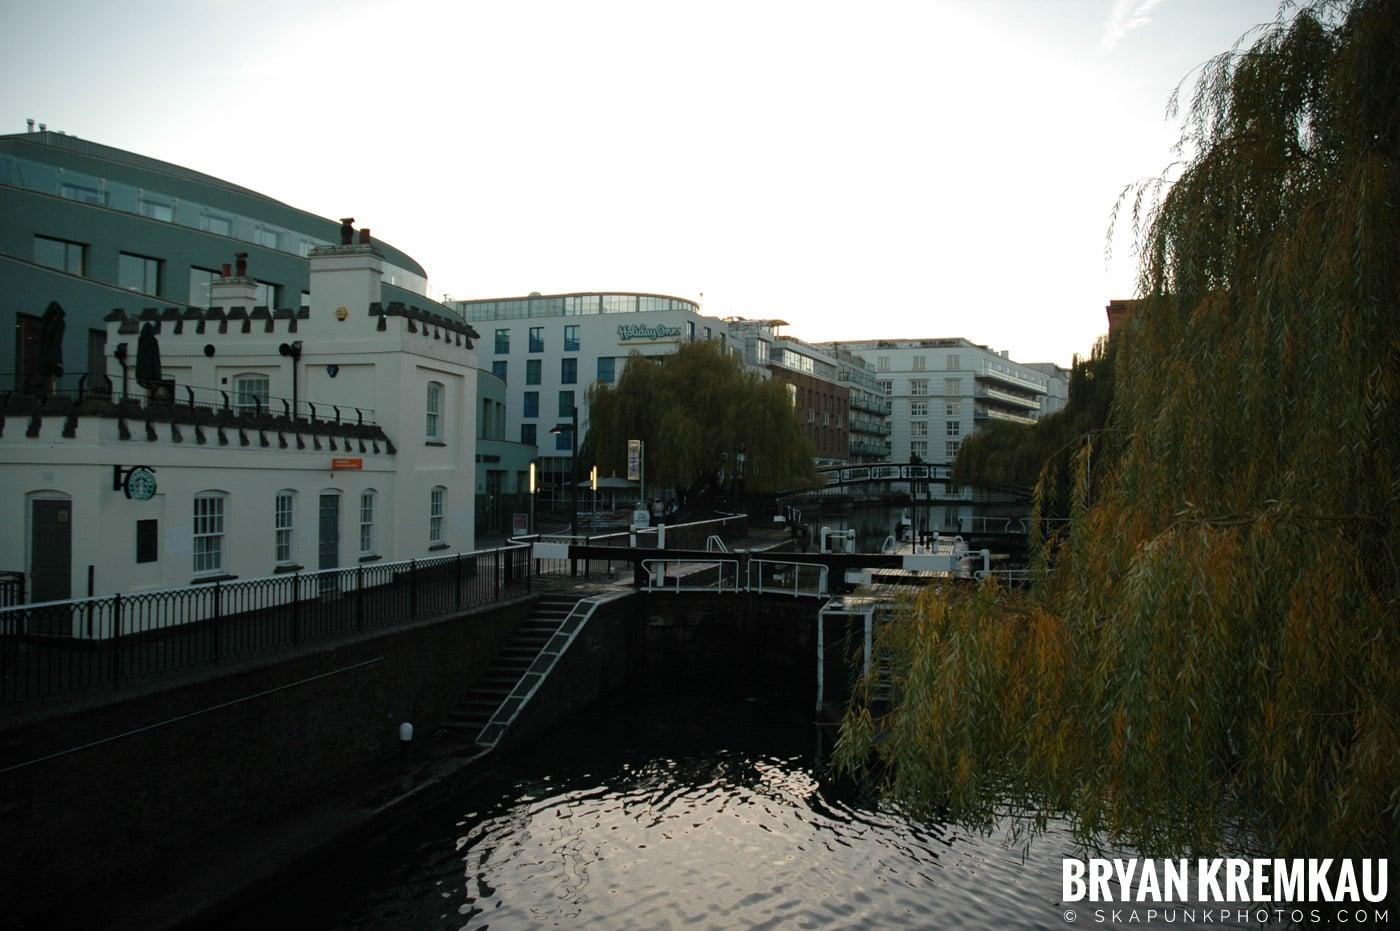 London, England - Day 4 - 12.19.05 (7)